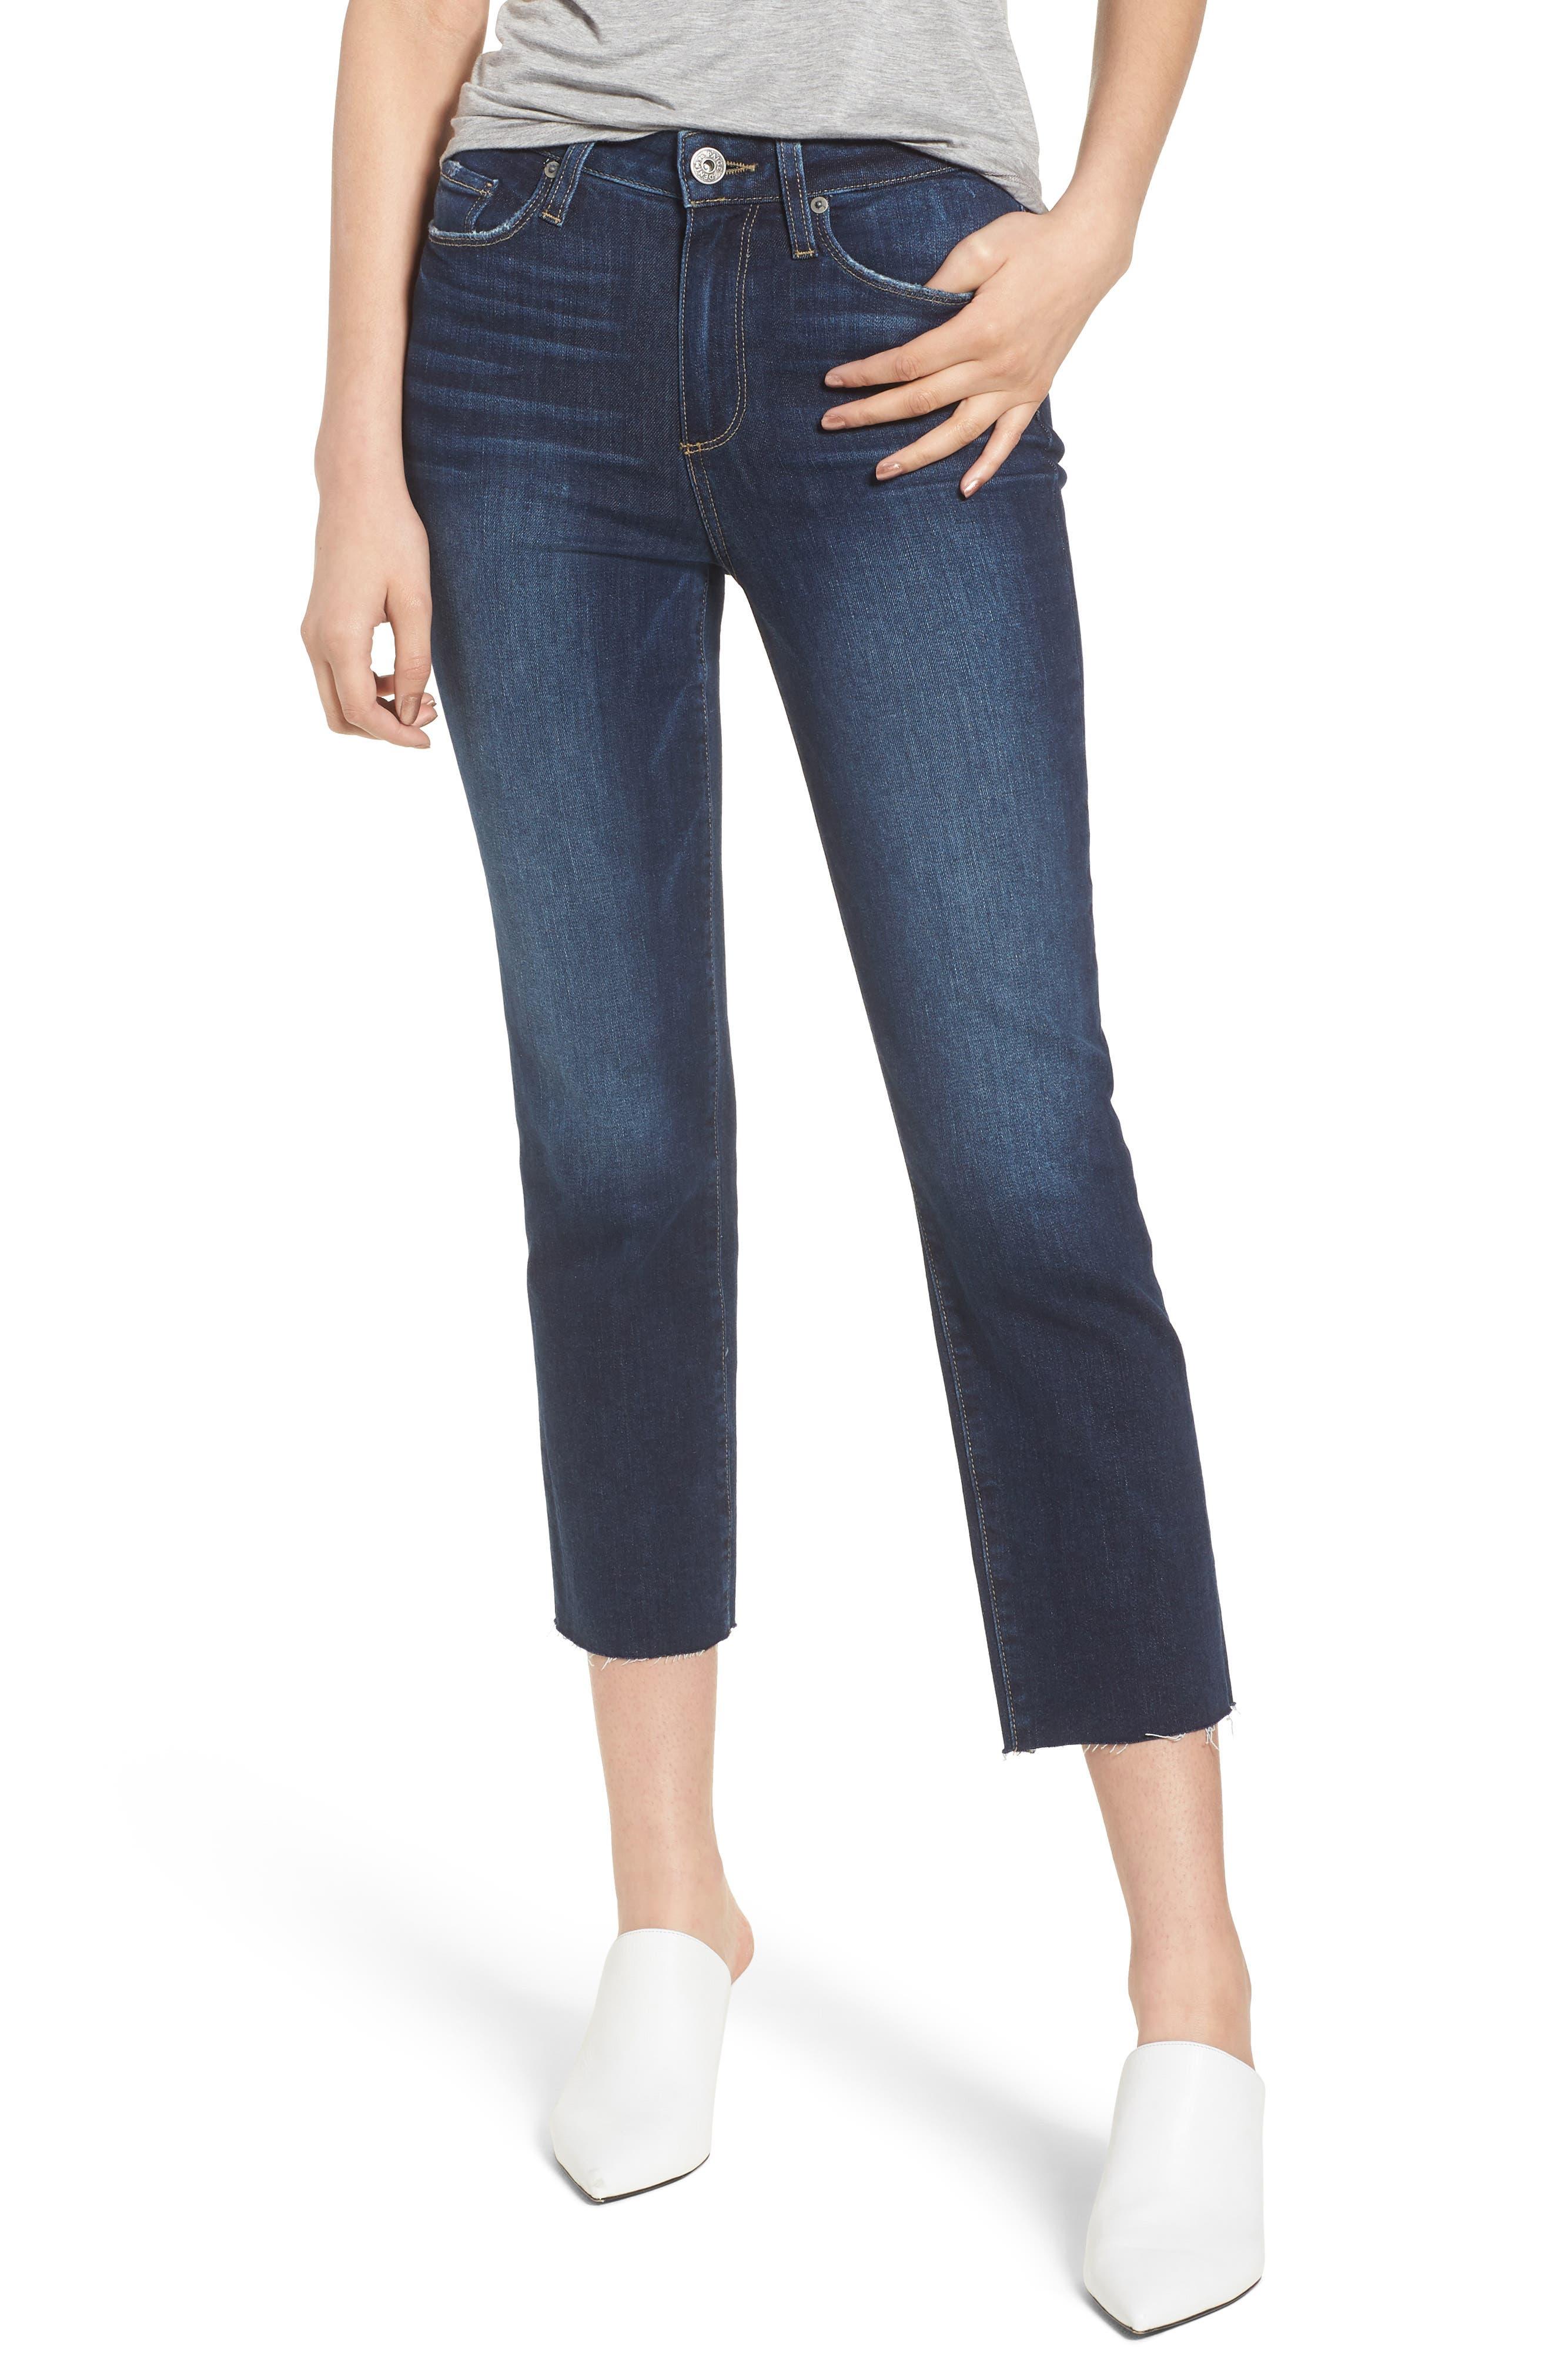 Hoxton High Waist Crop Straight Leg Jeans,                         Main,                         color, Mazzetti